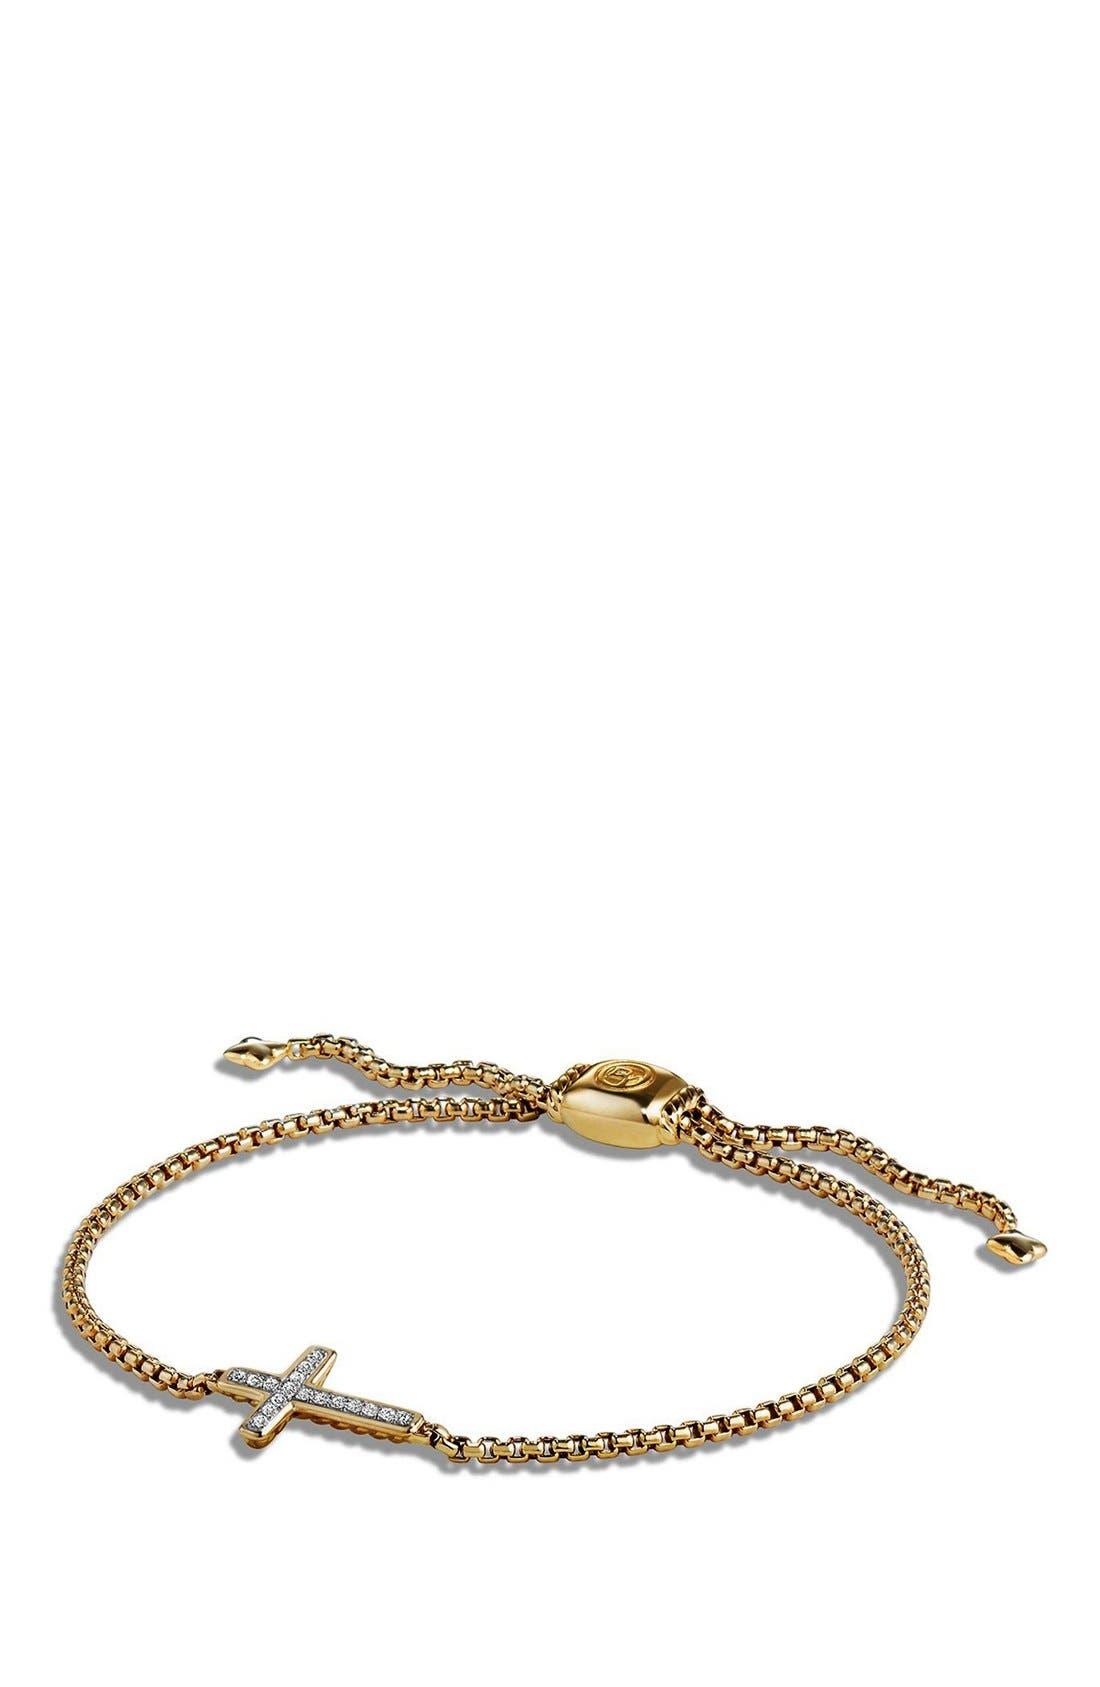 'Petite Pavé' Cross Bracelet with Diamonds in 18K Gold,                         Main,                         color, GOLD